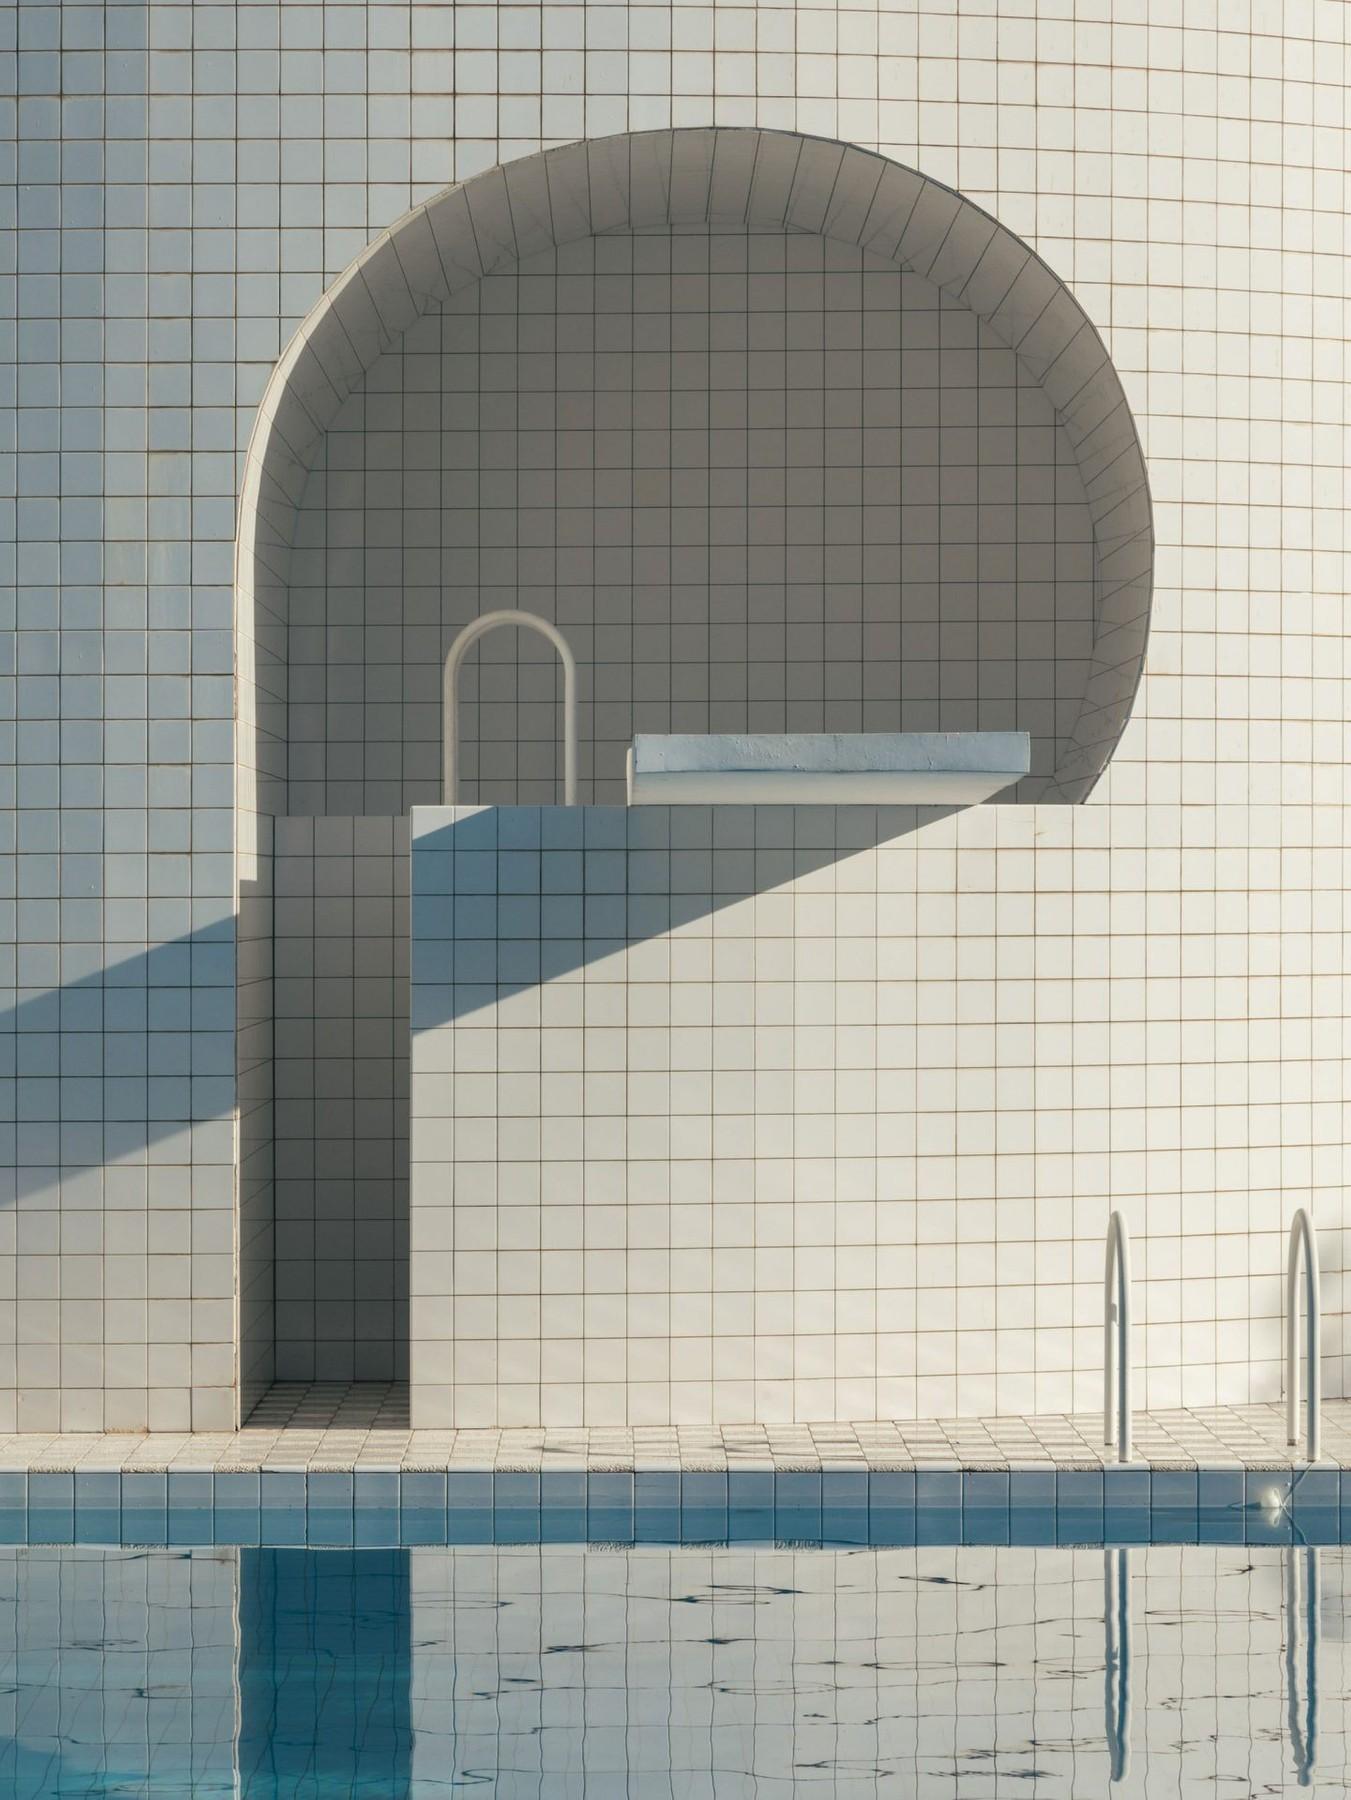 ignant-architecture-romain-laprade-domestic-pool-003-1-1440x1919.jpg